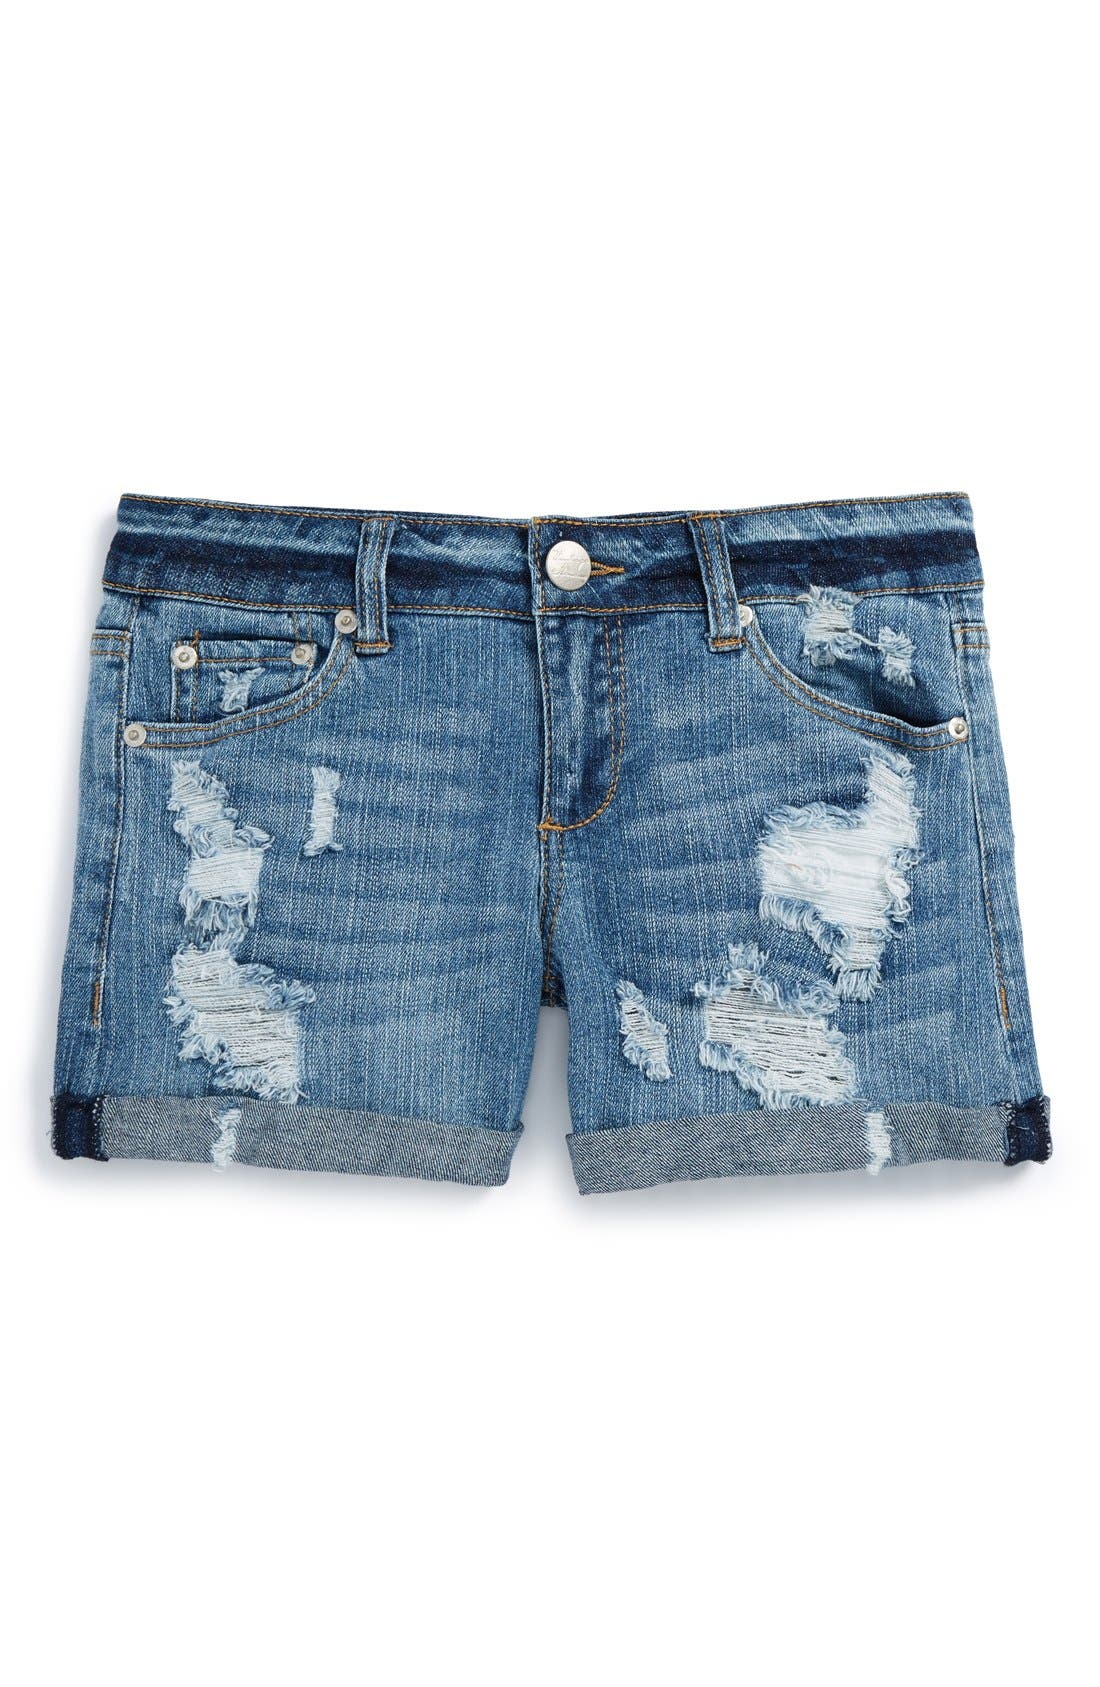 Alternate Image 1 Selected - Vintage Havana Cuff Denim Boyfriend Shorts (Big Girls)